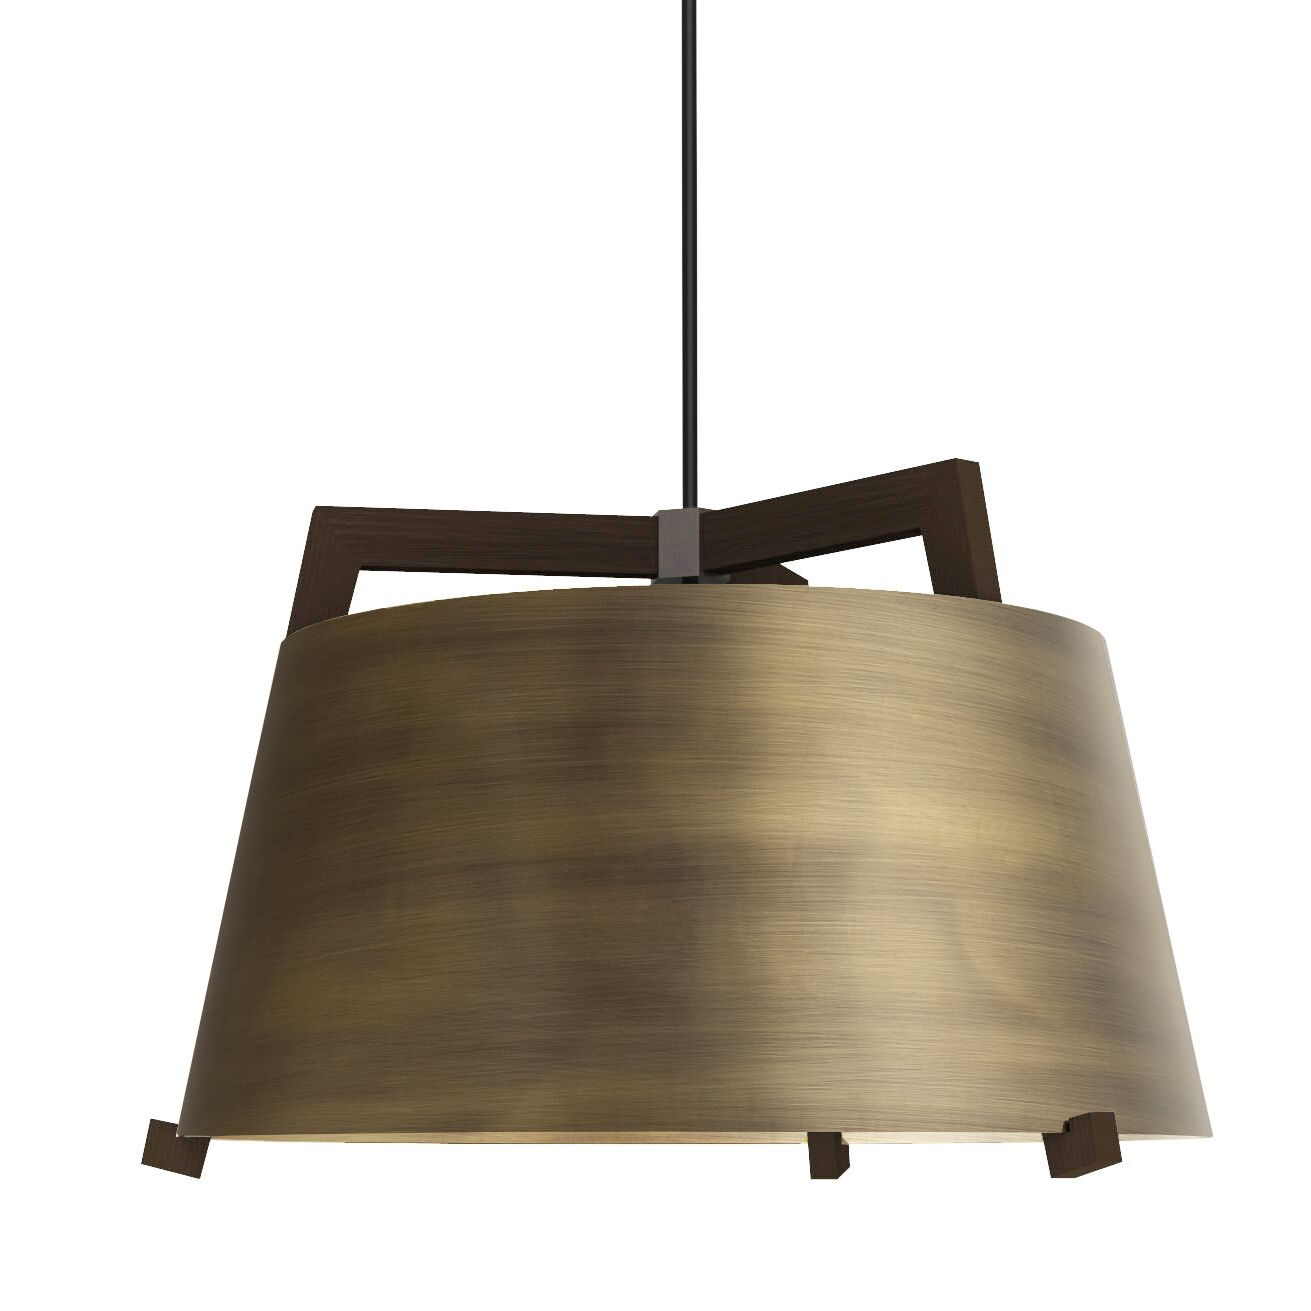 Ignis 1-Light Inverted Pendant Finish: Oiled Walnut/Distressed Brass